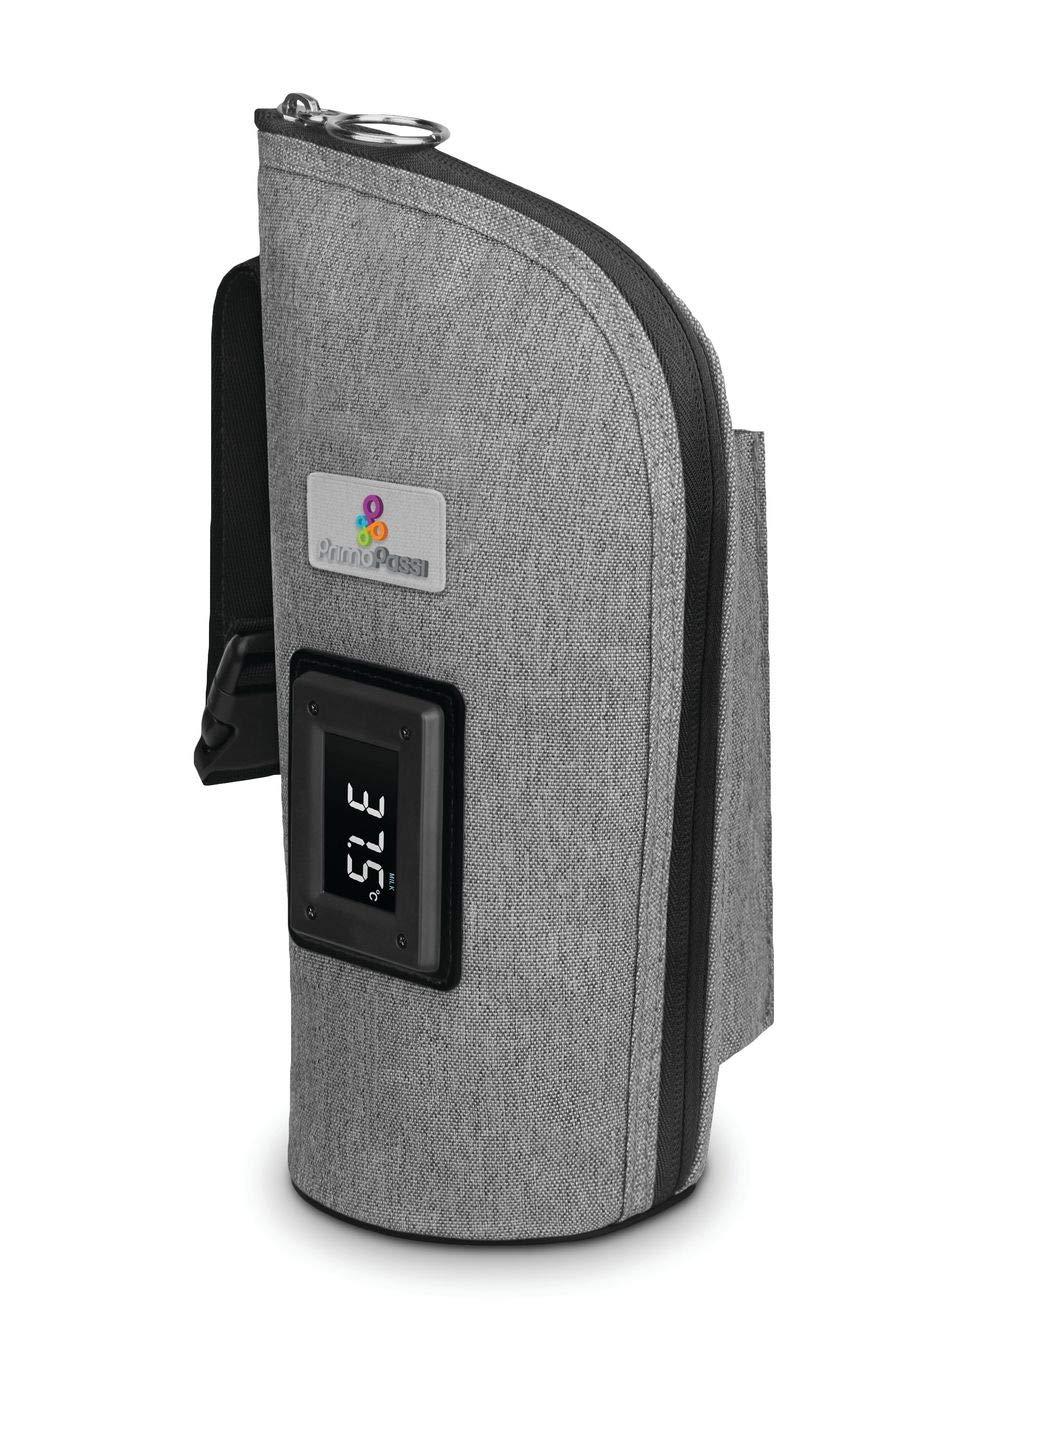 Primo Passi USB Portable Smart Bottle Warmer